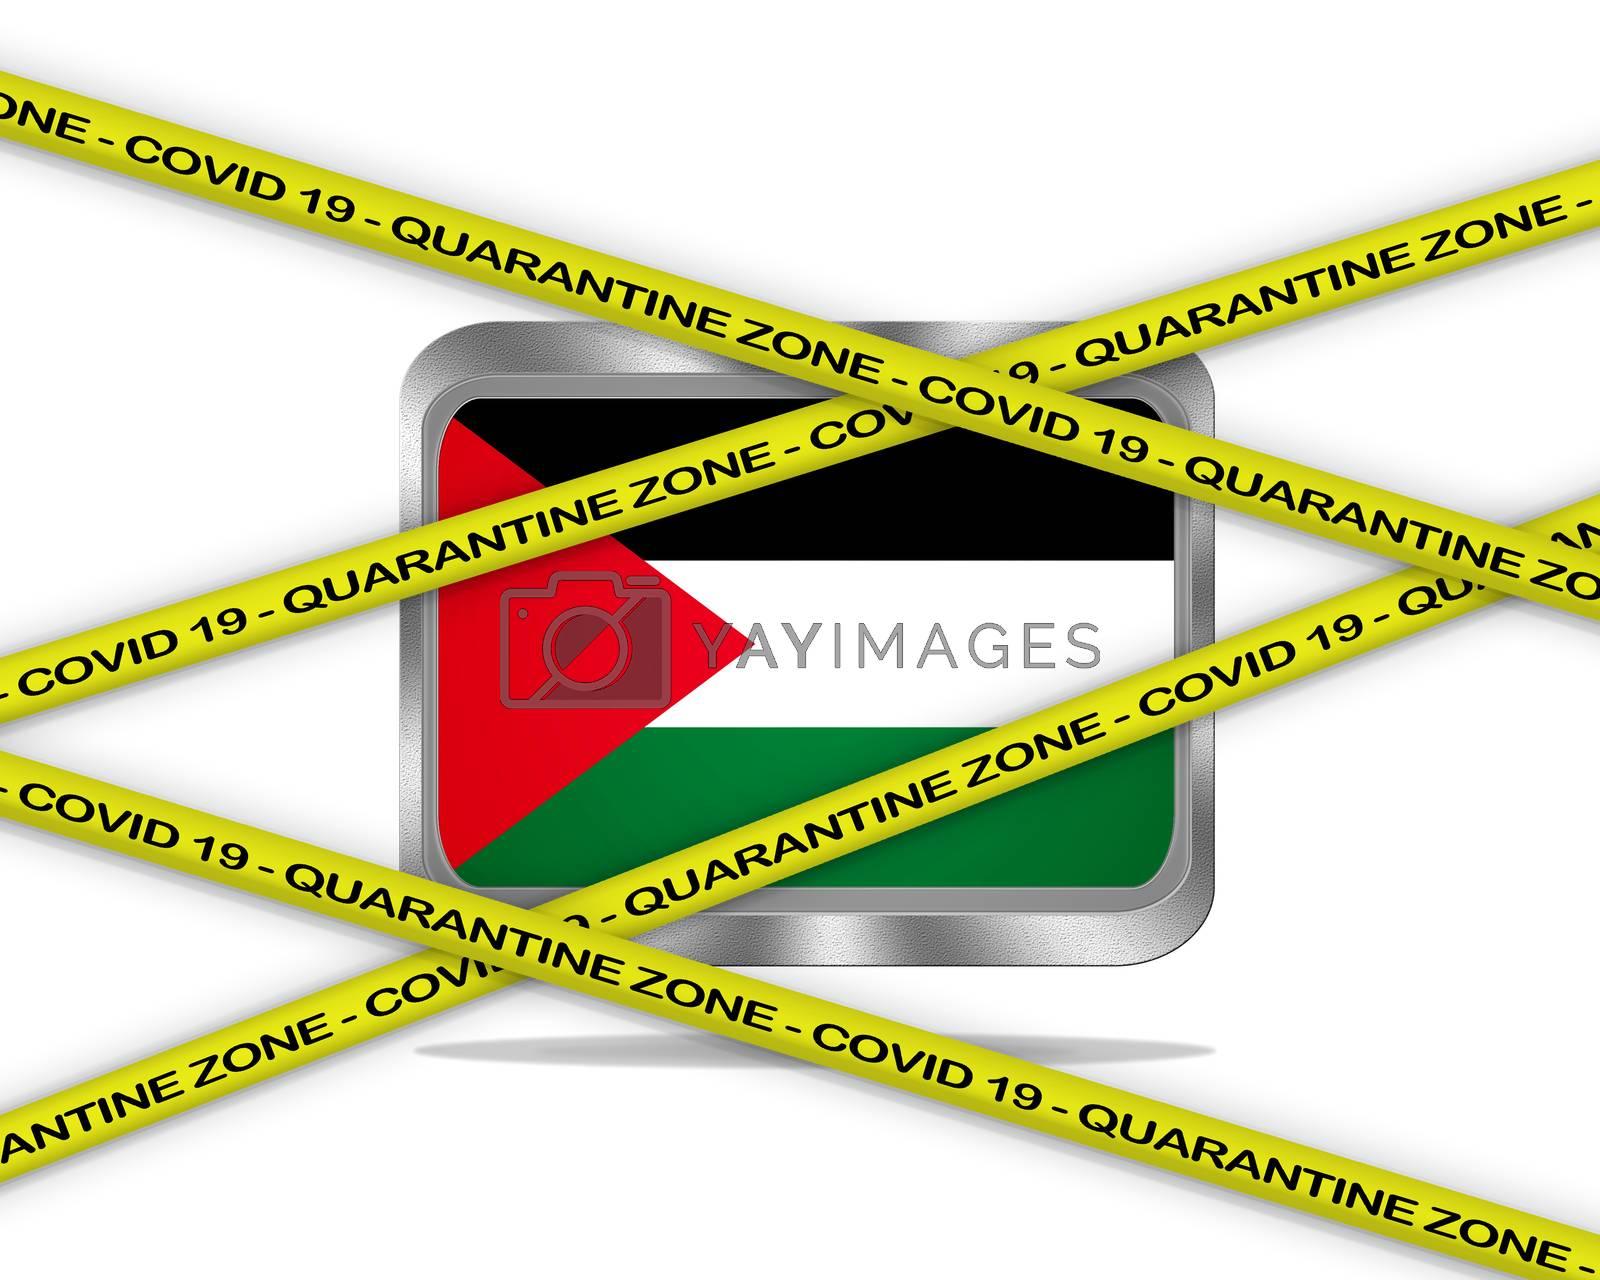 COVID-19 warning yellow ribbon written with: Quarantine zone Cover 19 on Palestine flag illustration. Coronavirus danger area, quarantined country.